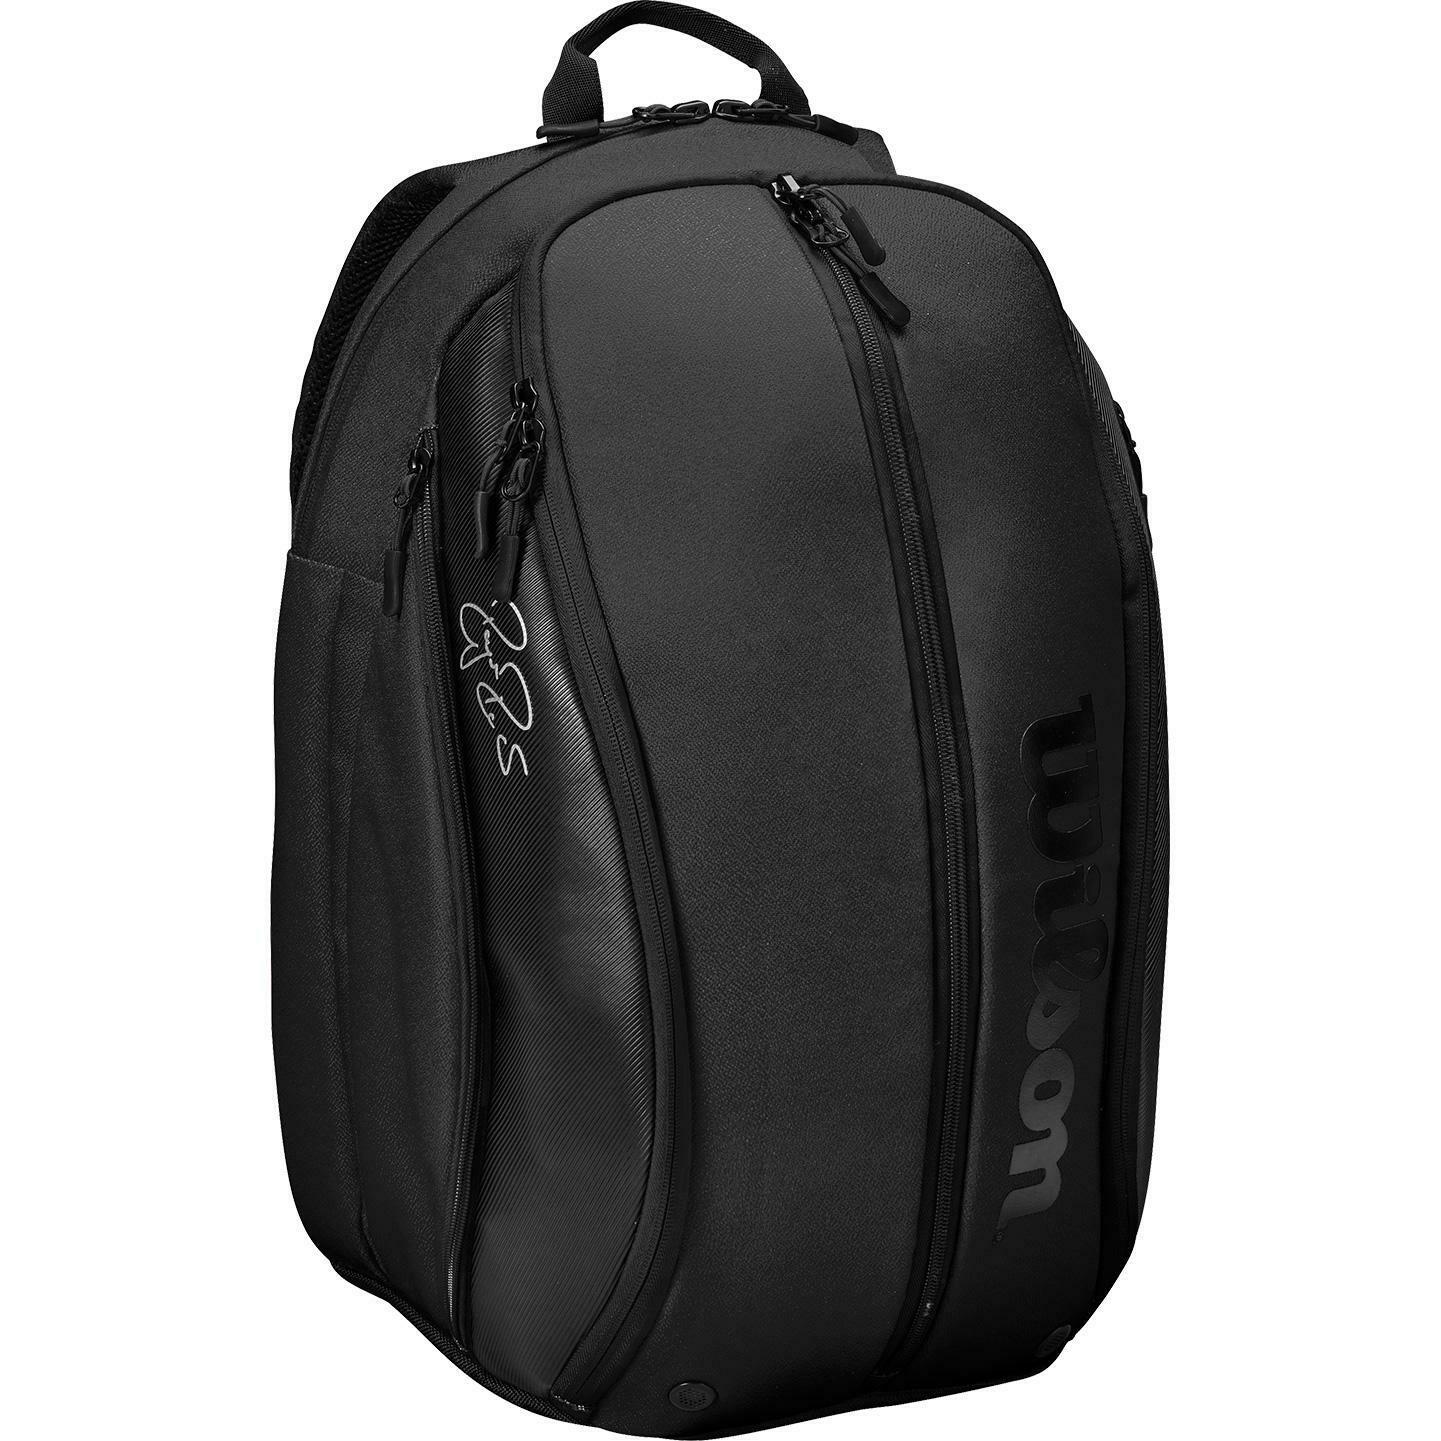 Wilson Federer DNA Backpack - Black